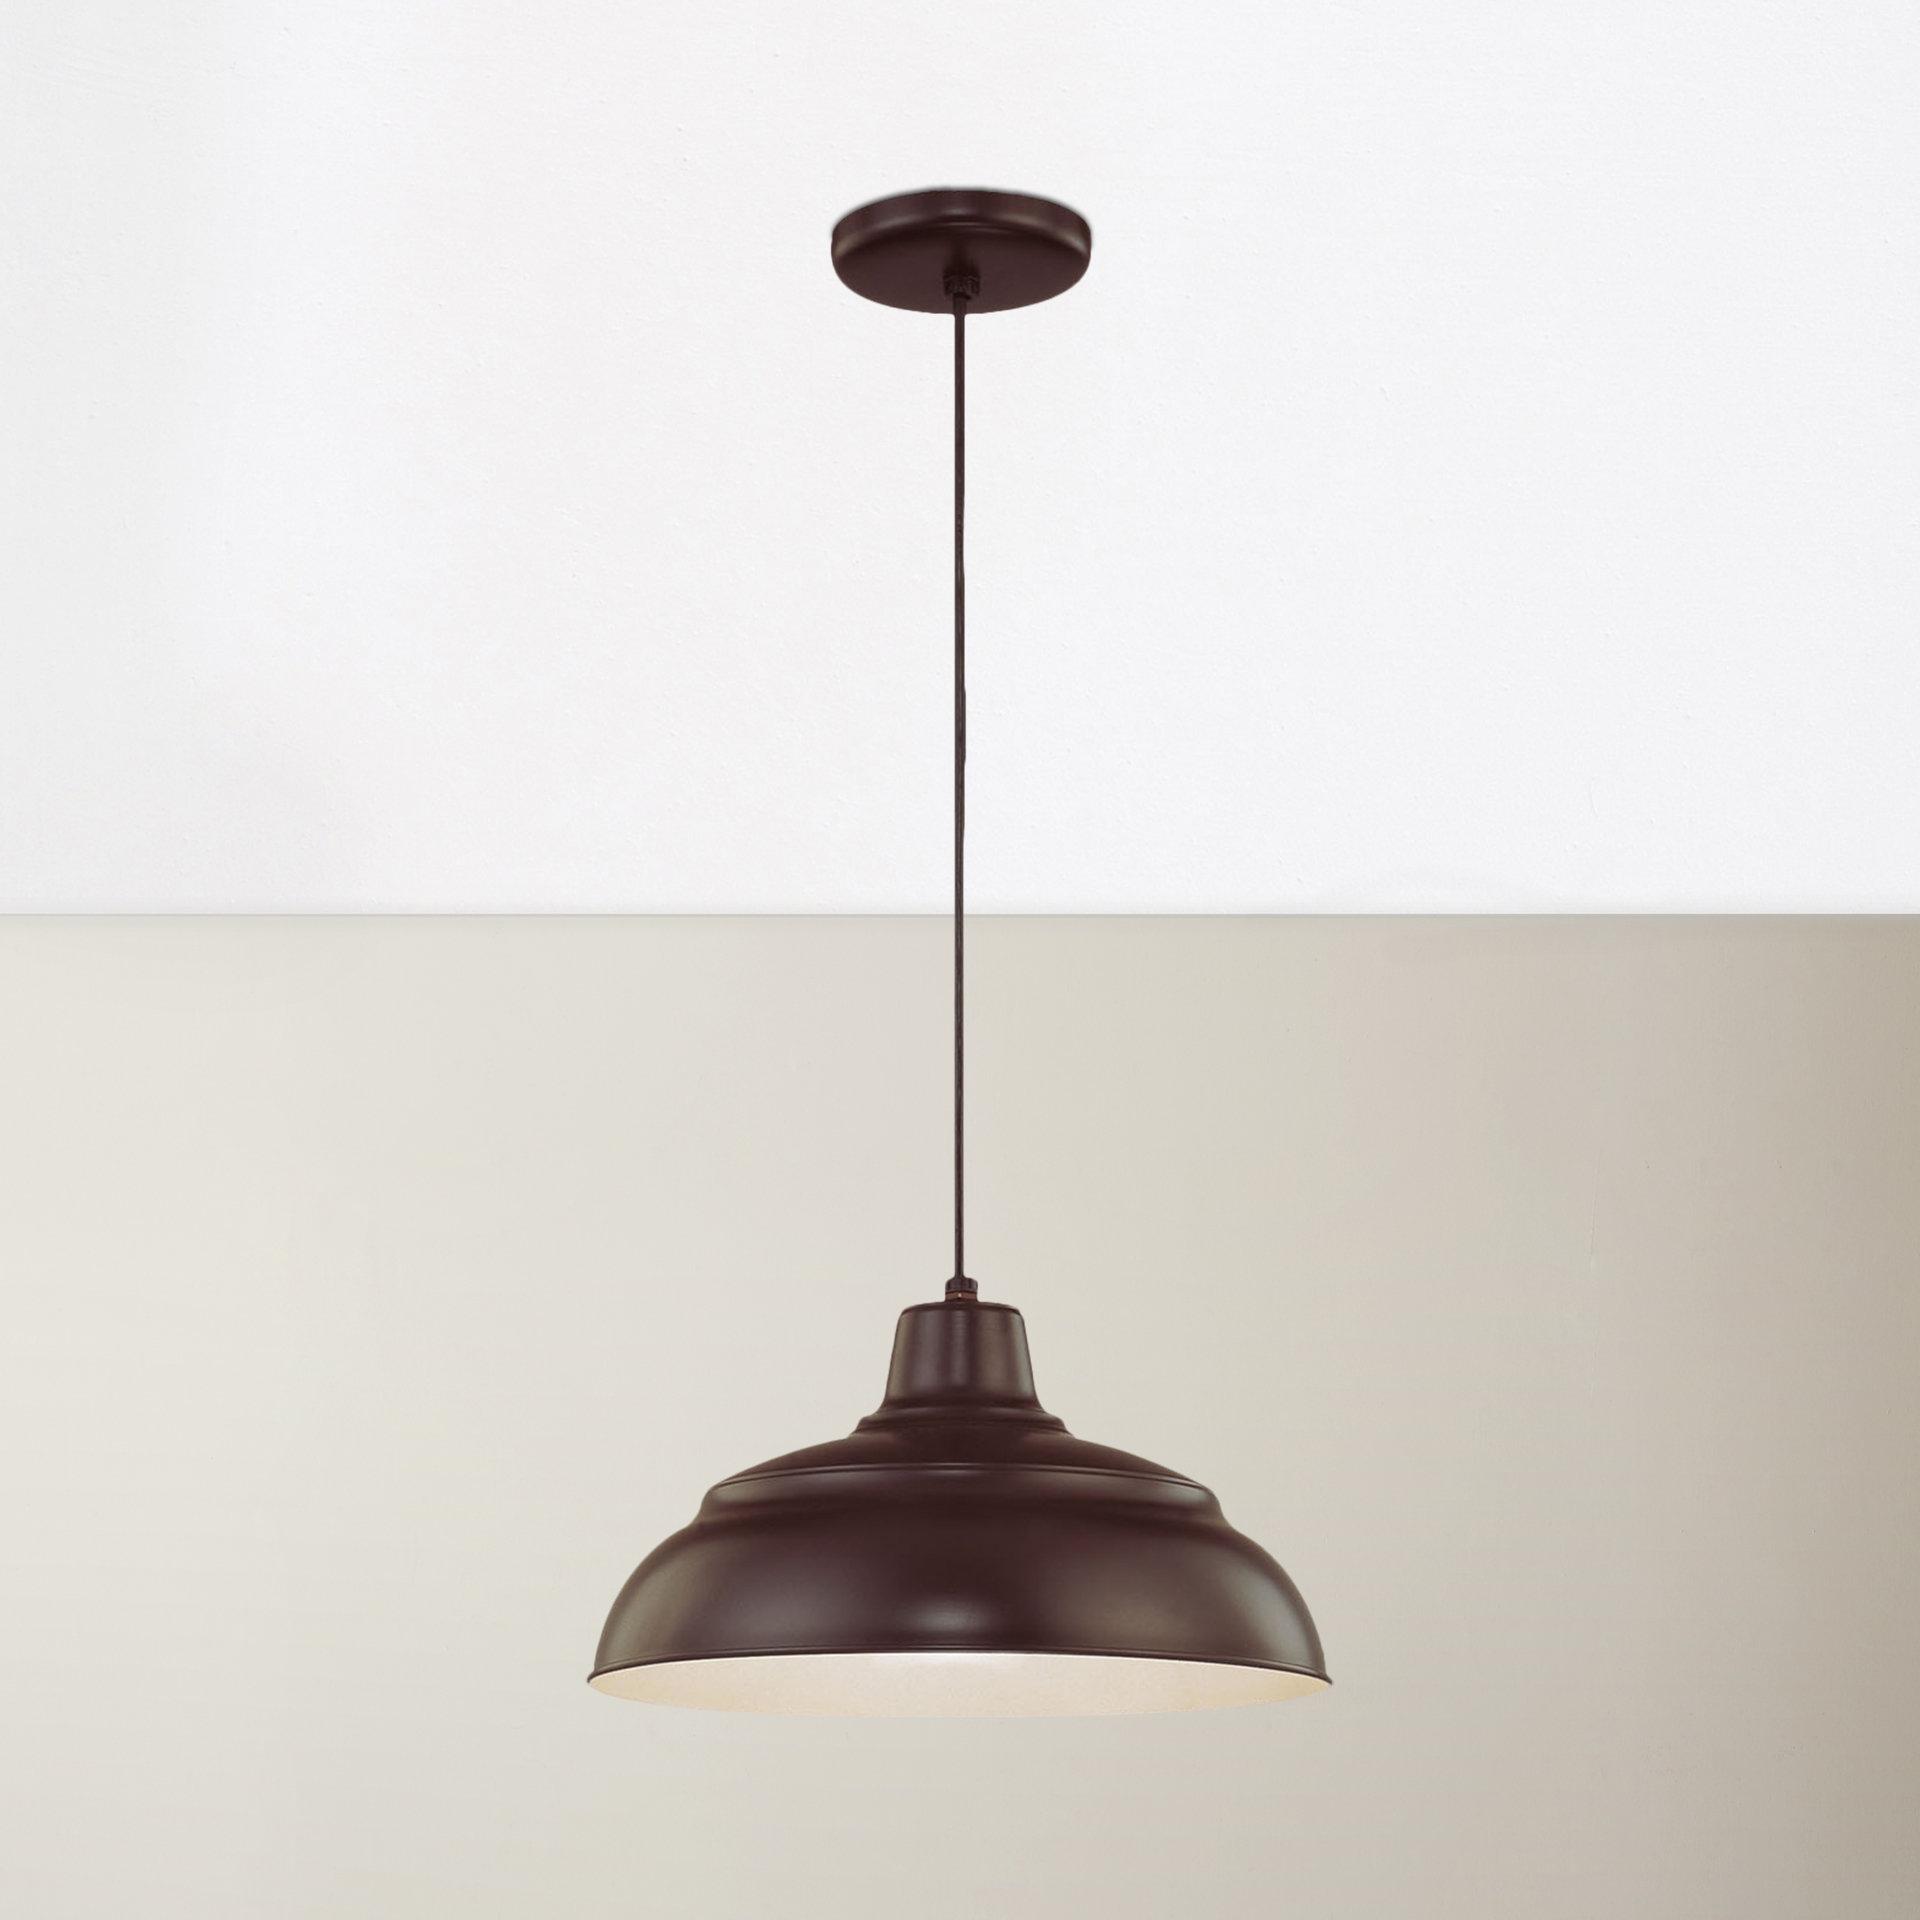 Trendy Stetson 1 Light Bowl Pendant For Abordale 1 Light Single Dome Pendants (View 23 of 25)